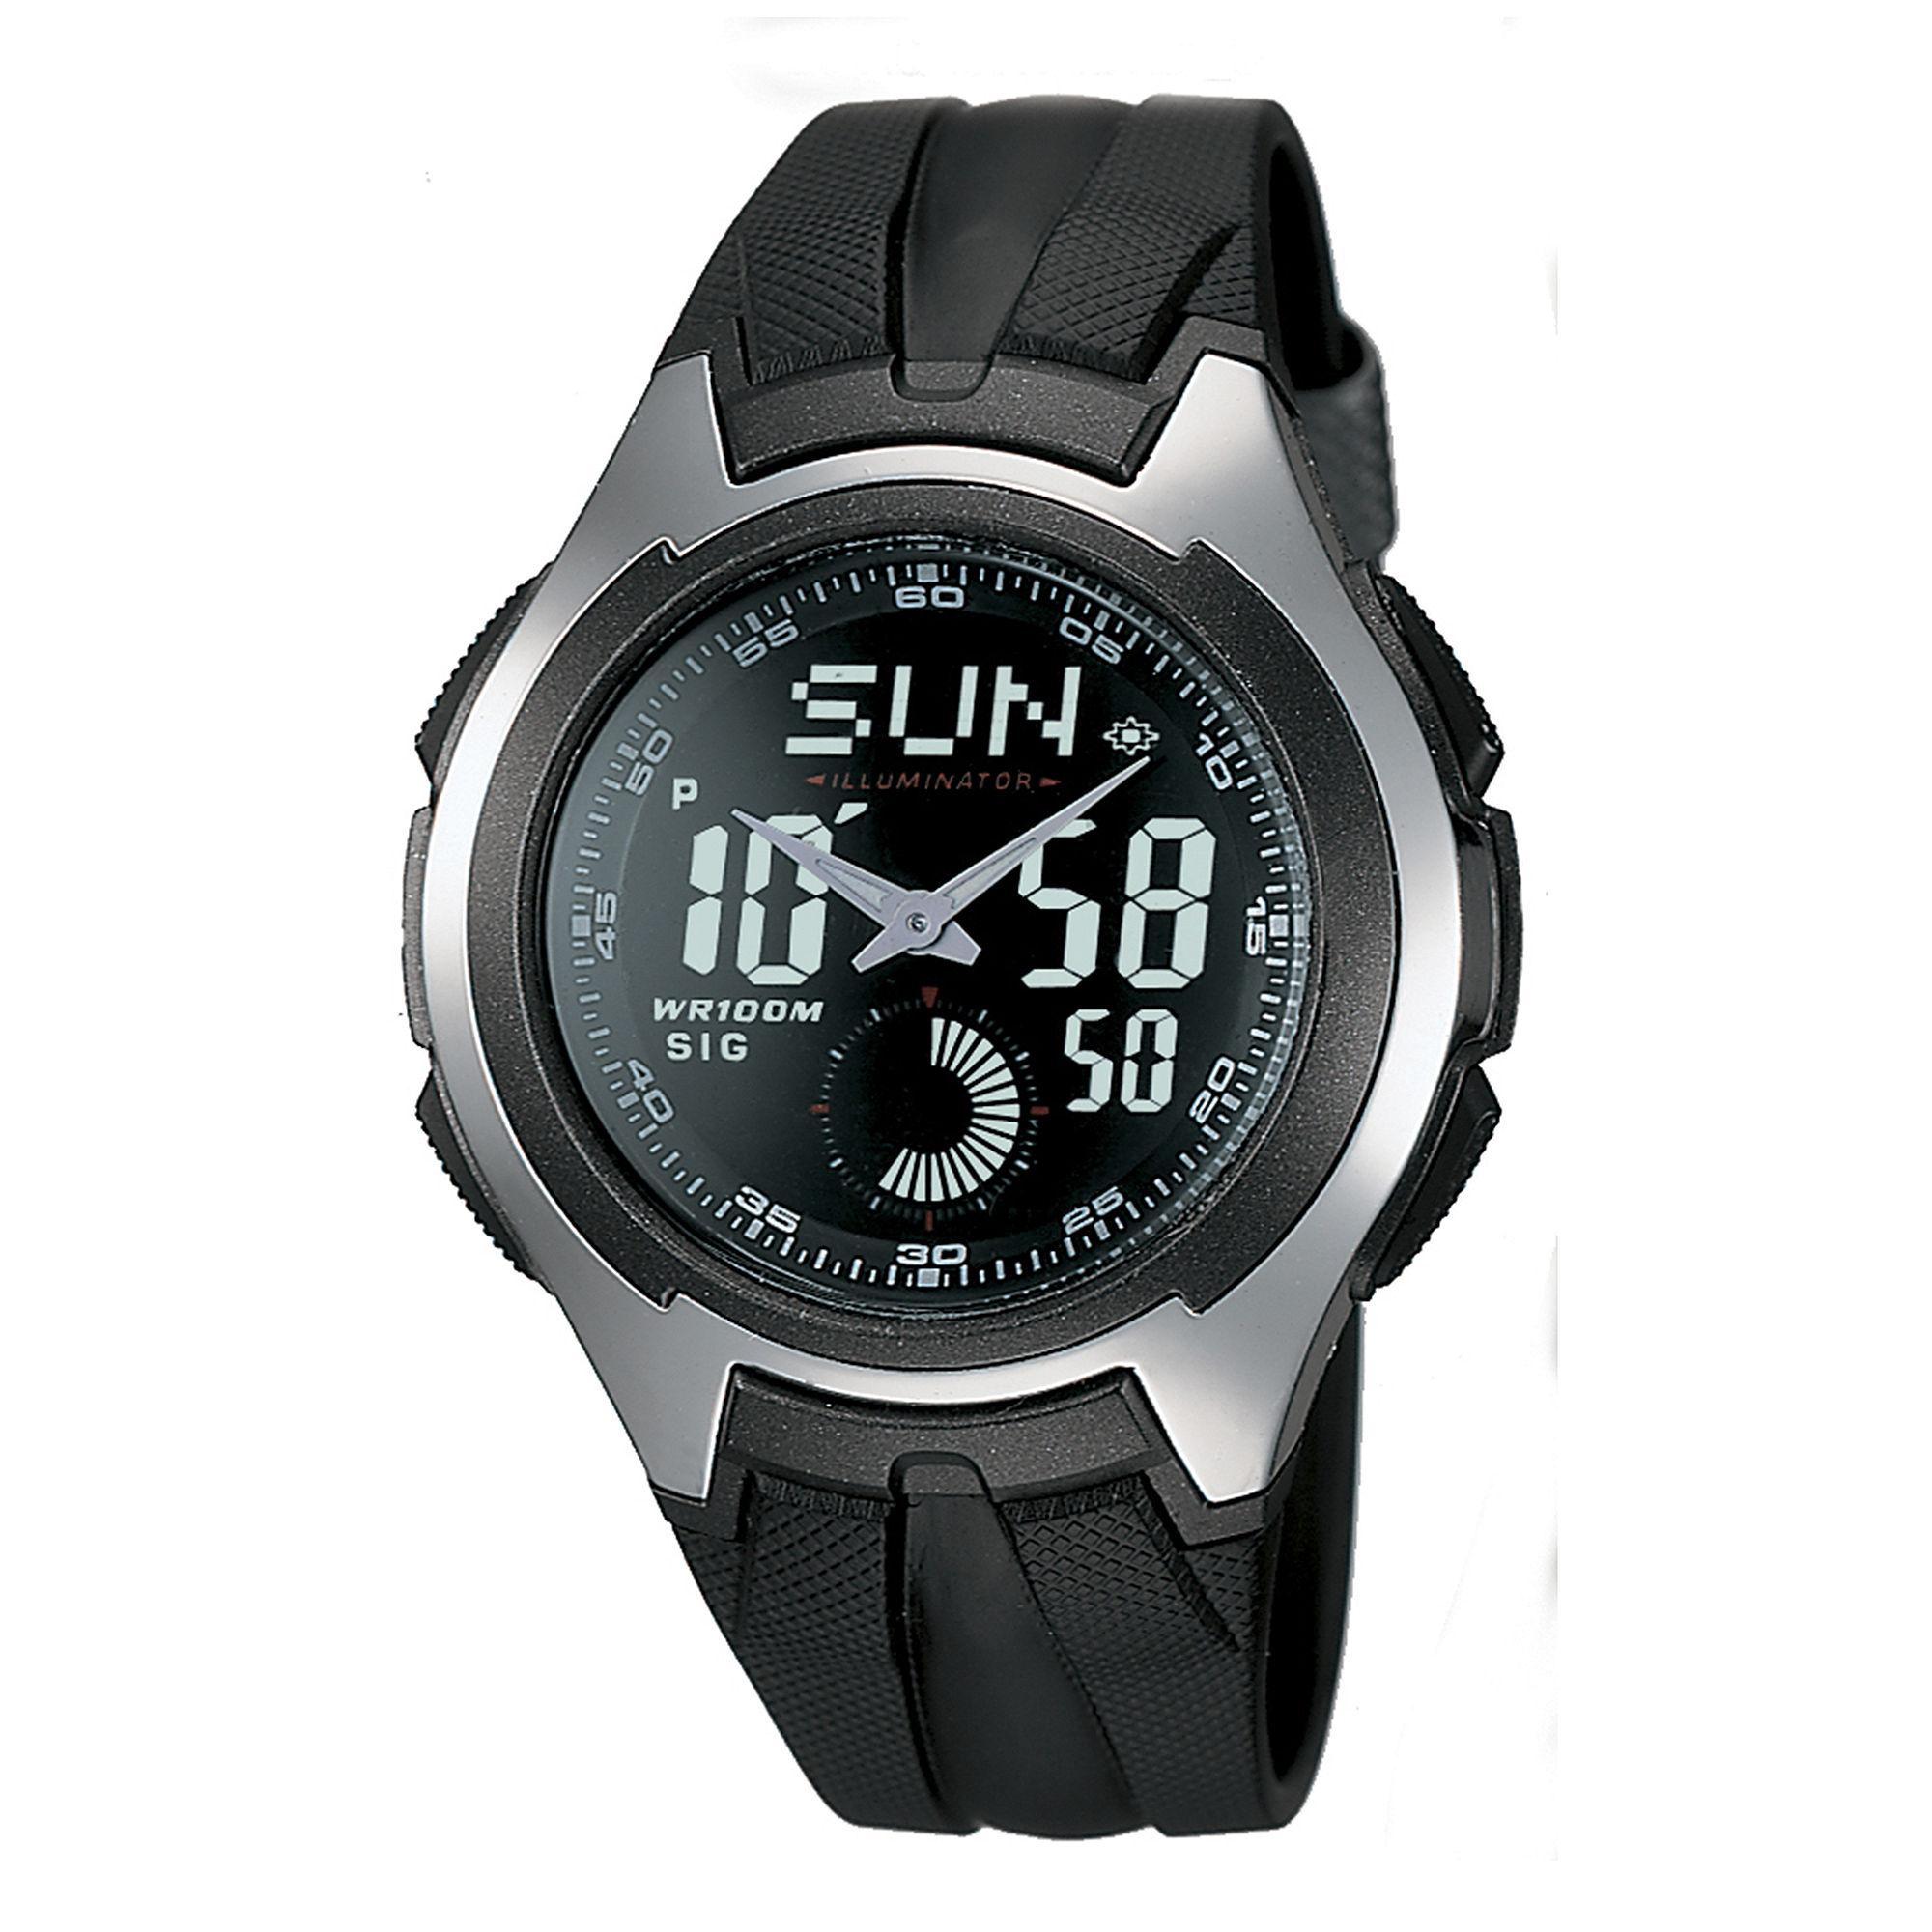 Casio Men's Ana-Digi Sport Watch - Black - AQ160W-1BV